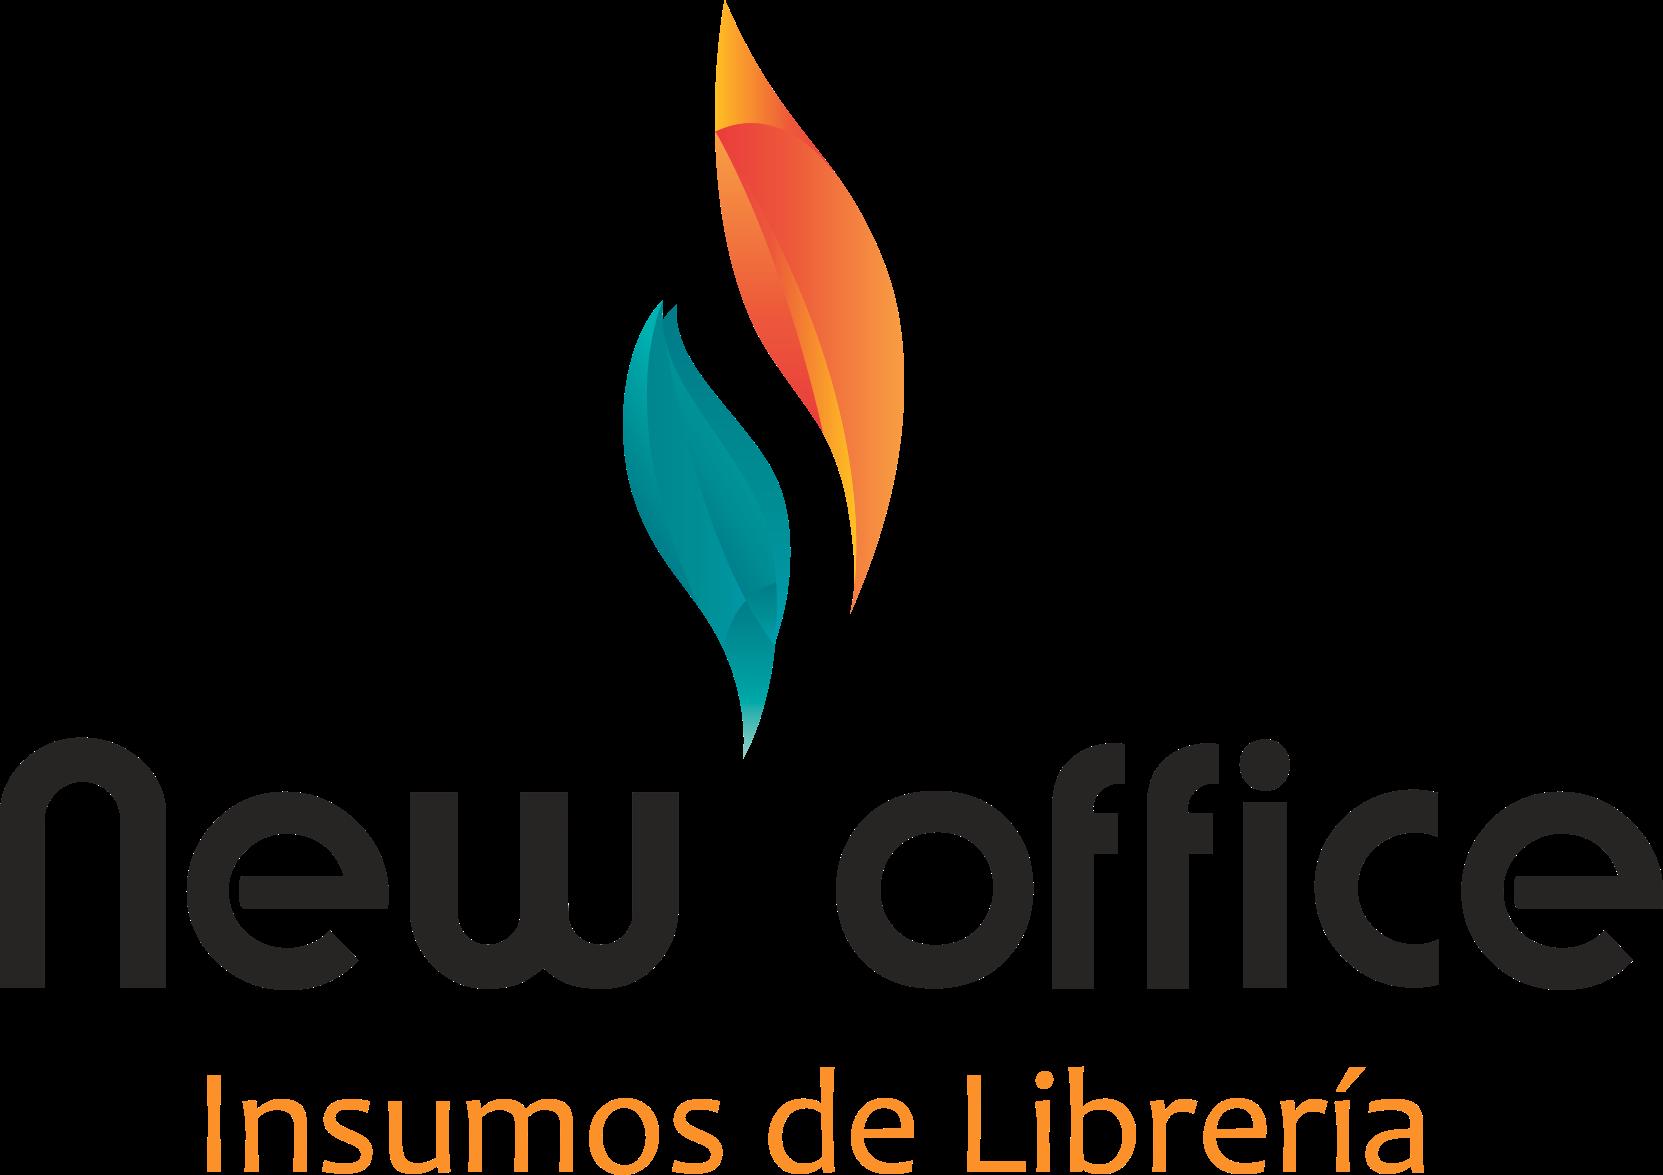 Newoffice.com.ar